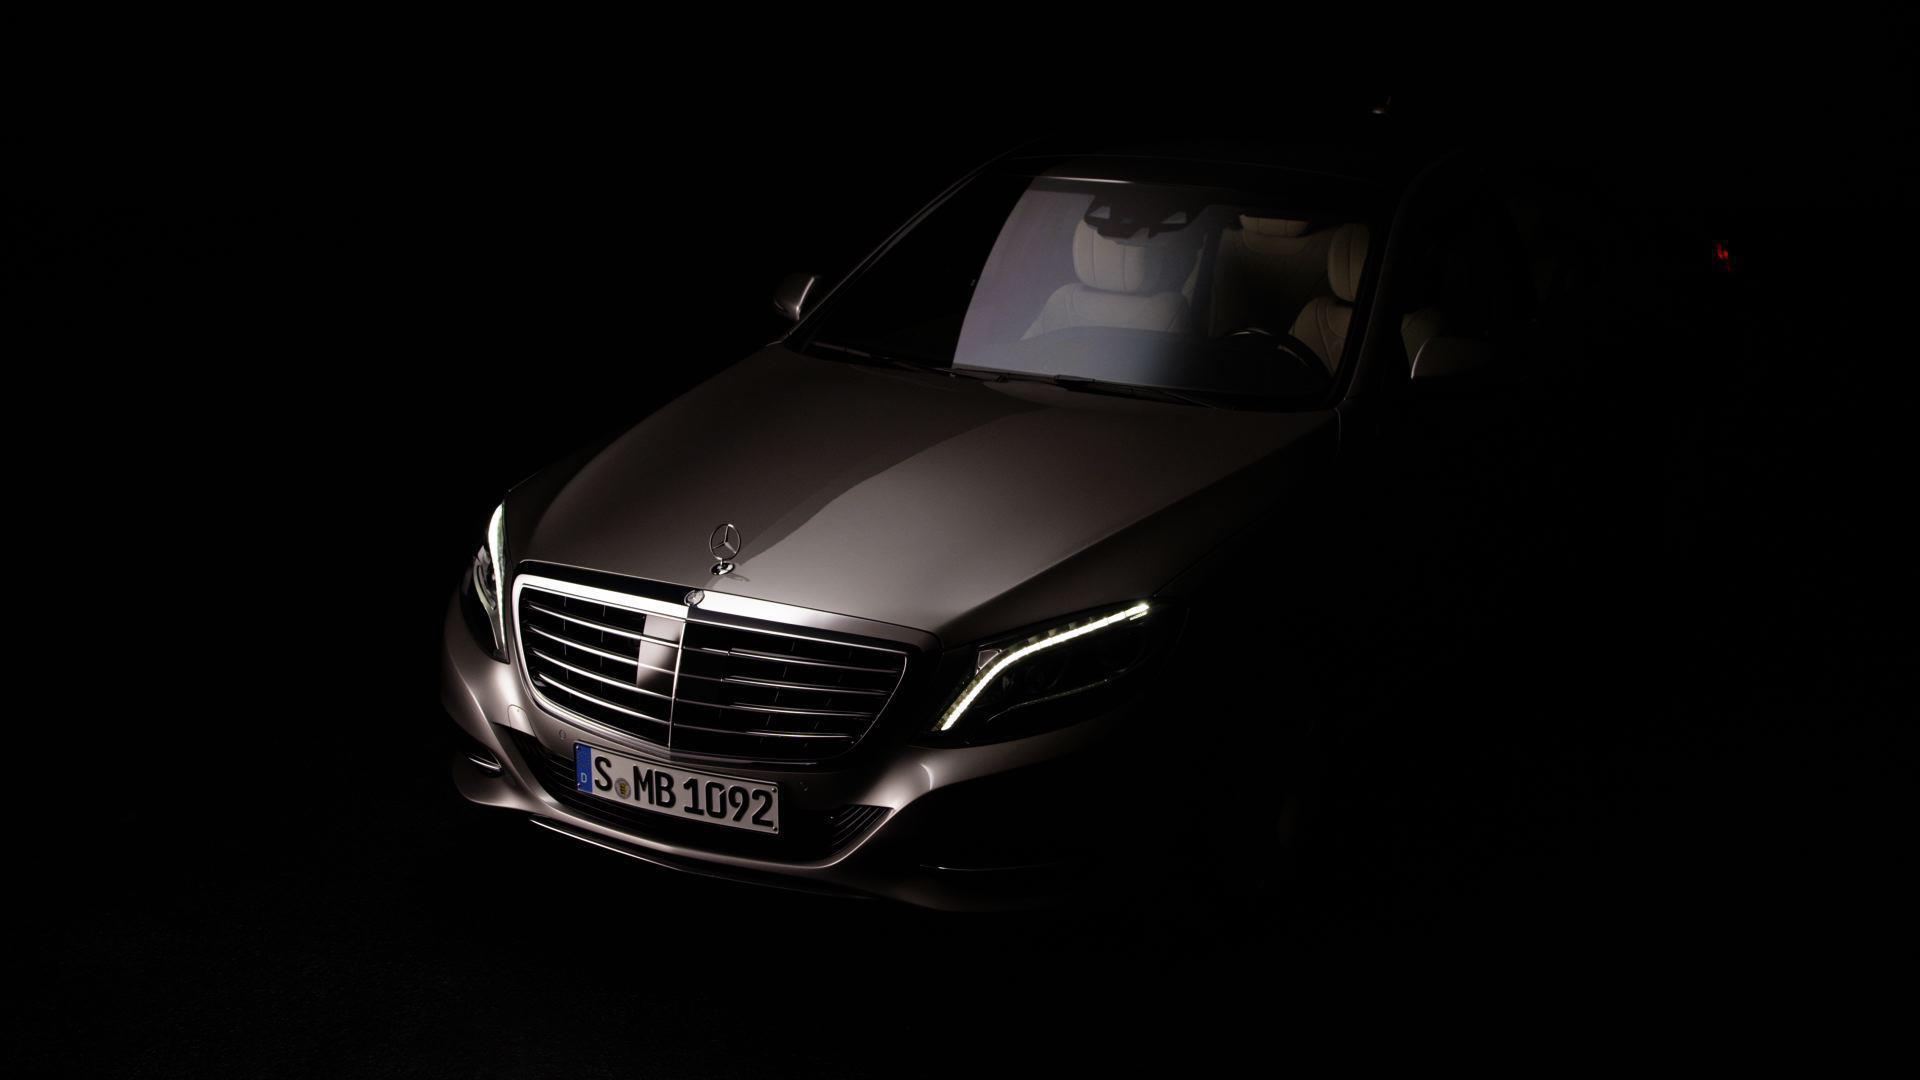 2014 mercedes benz s class hits the us market for Mercedes benz usa com